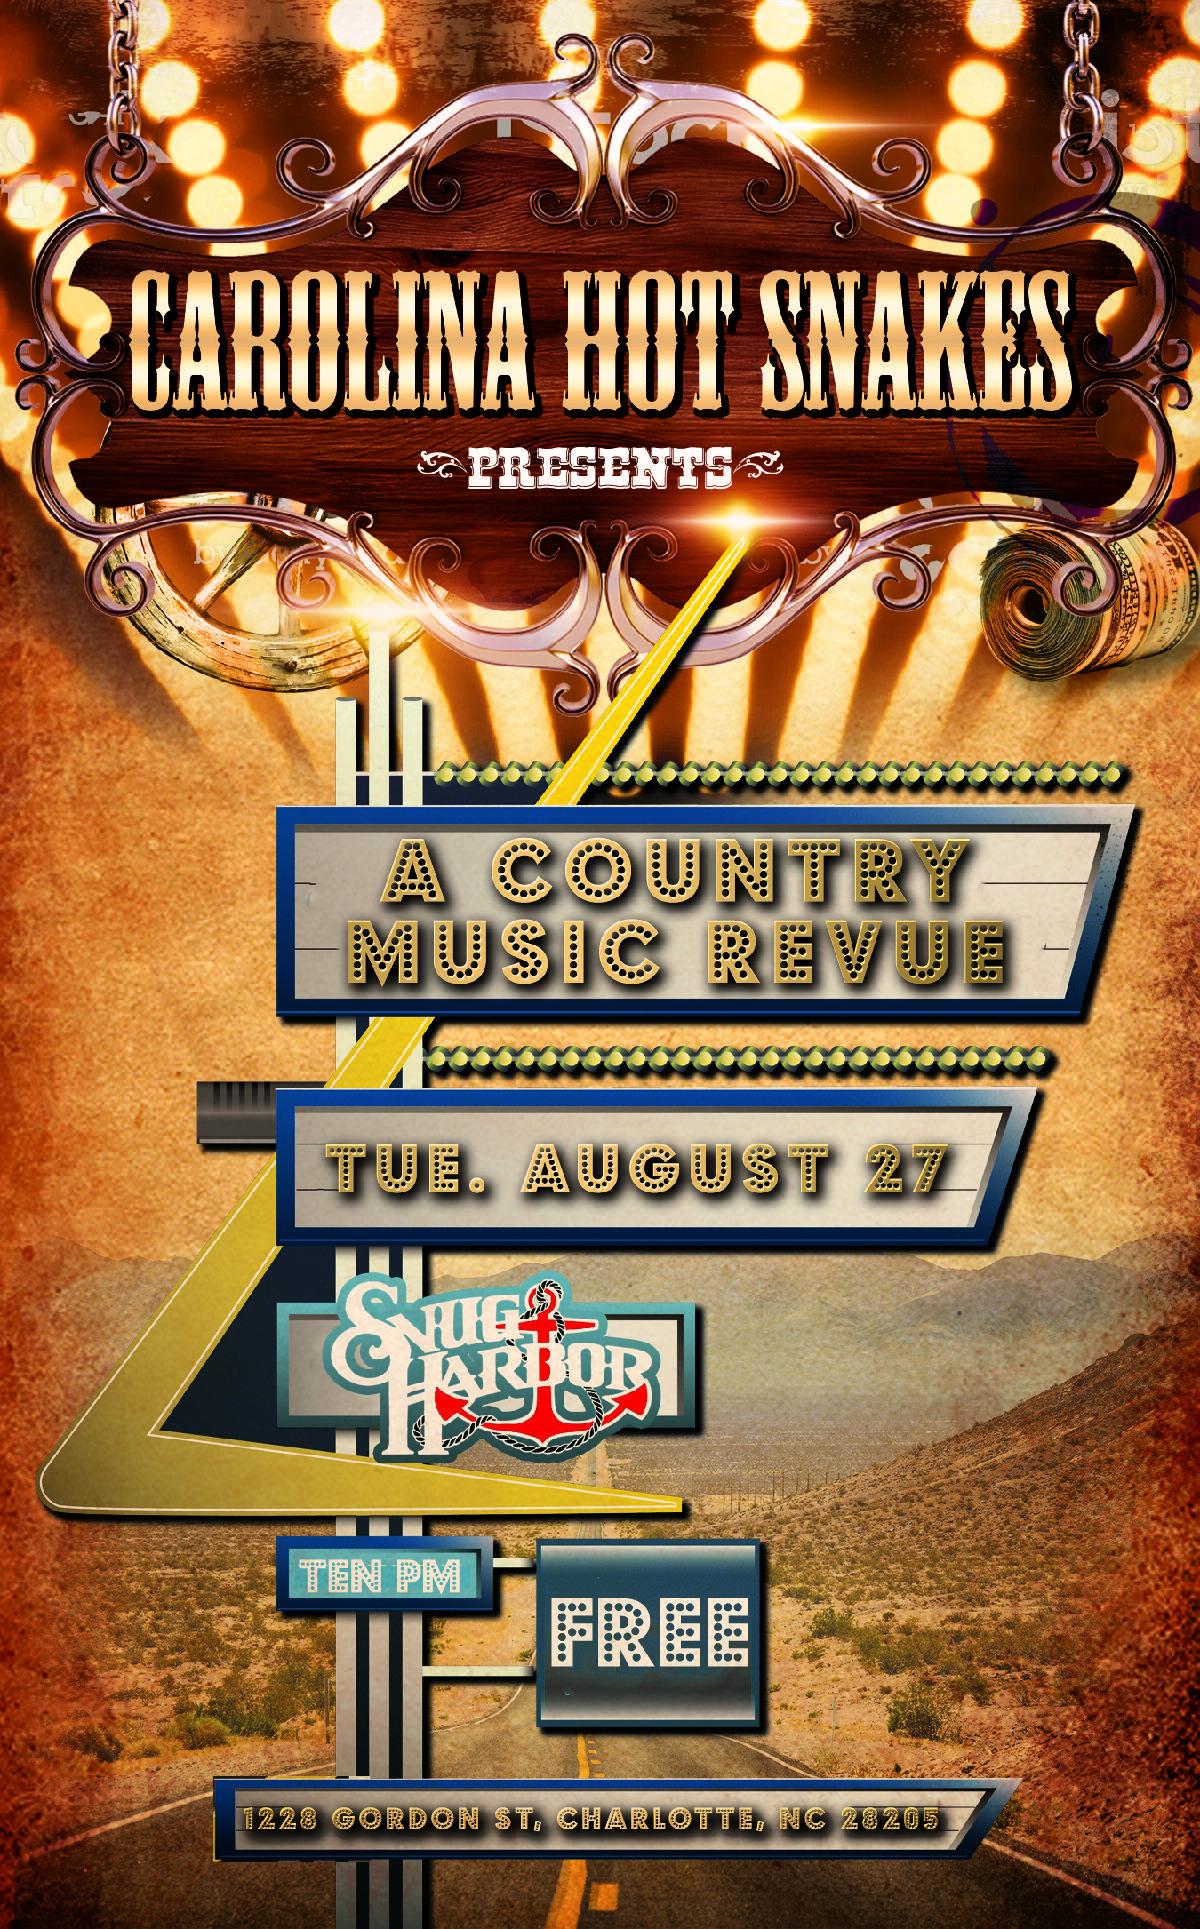 Snug Harbor :: Carolina Hot Snakes present A COUNTRY MUSIC REVUE